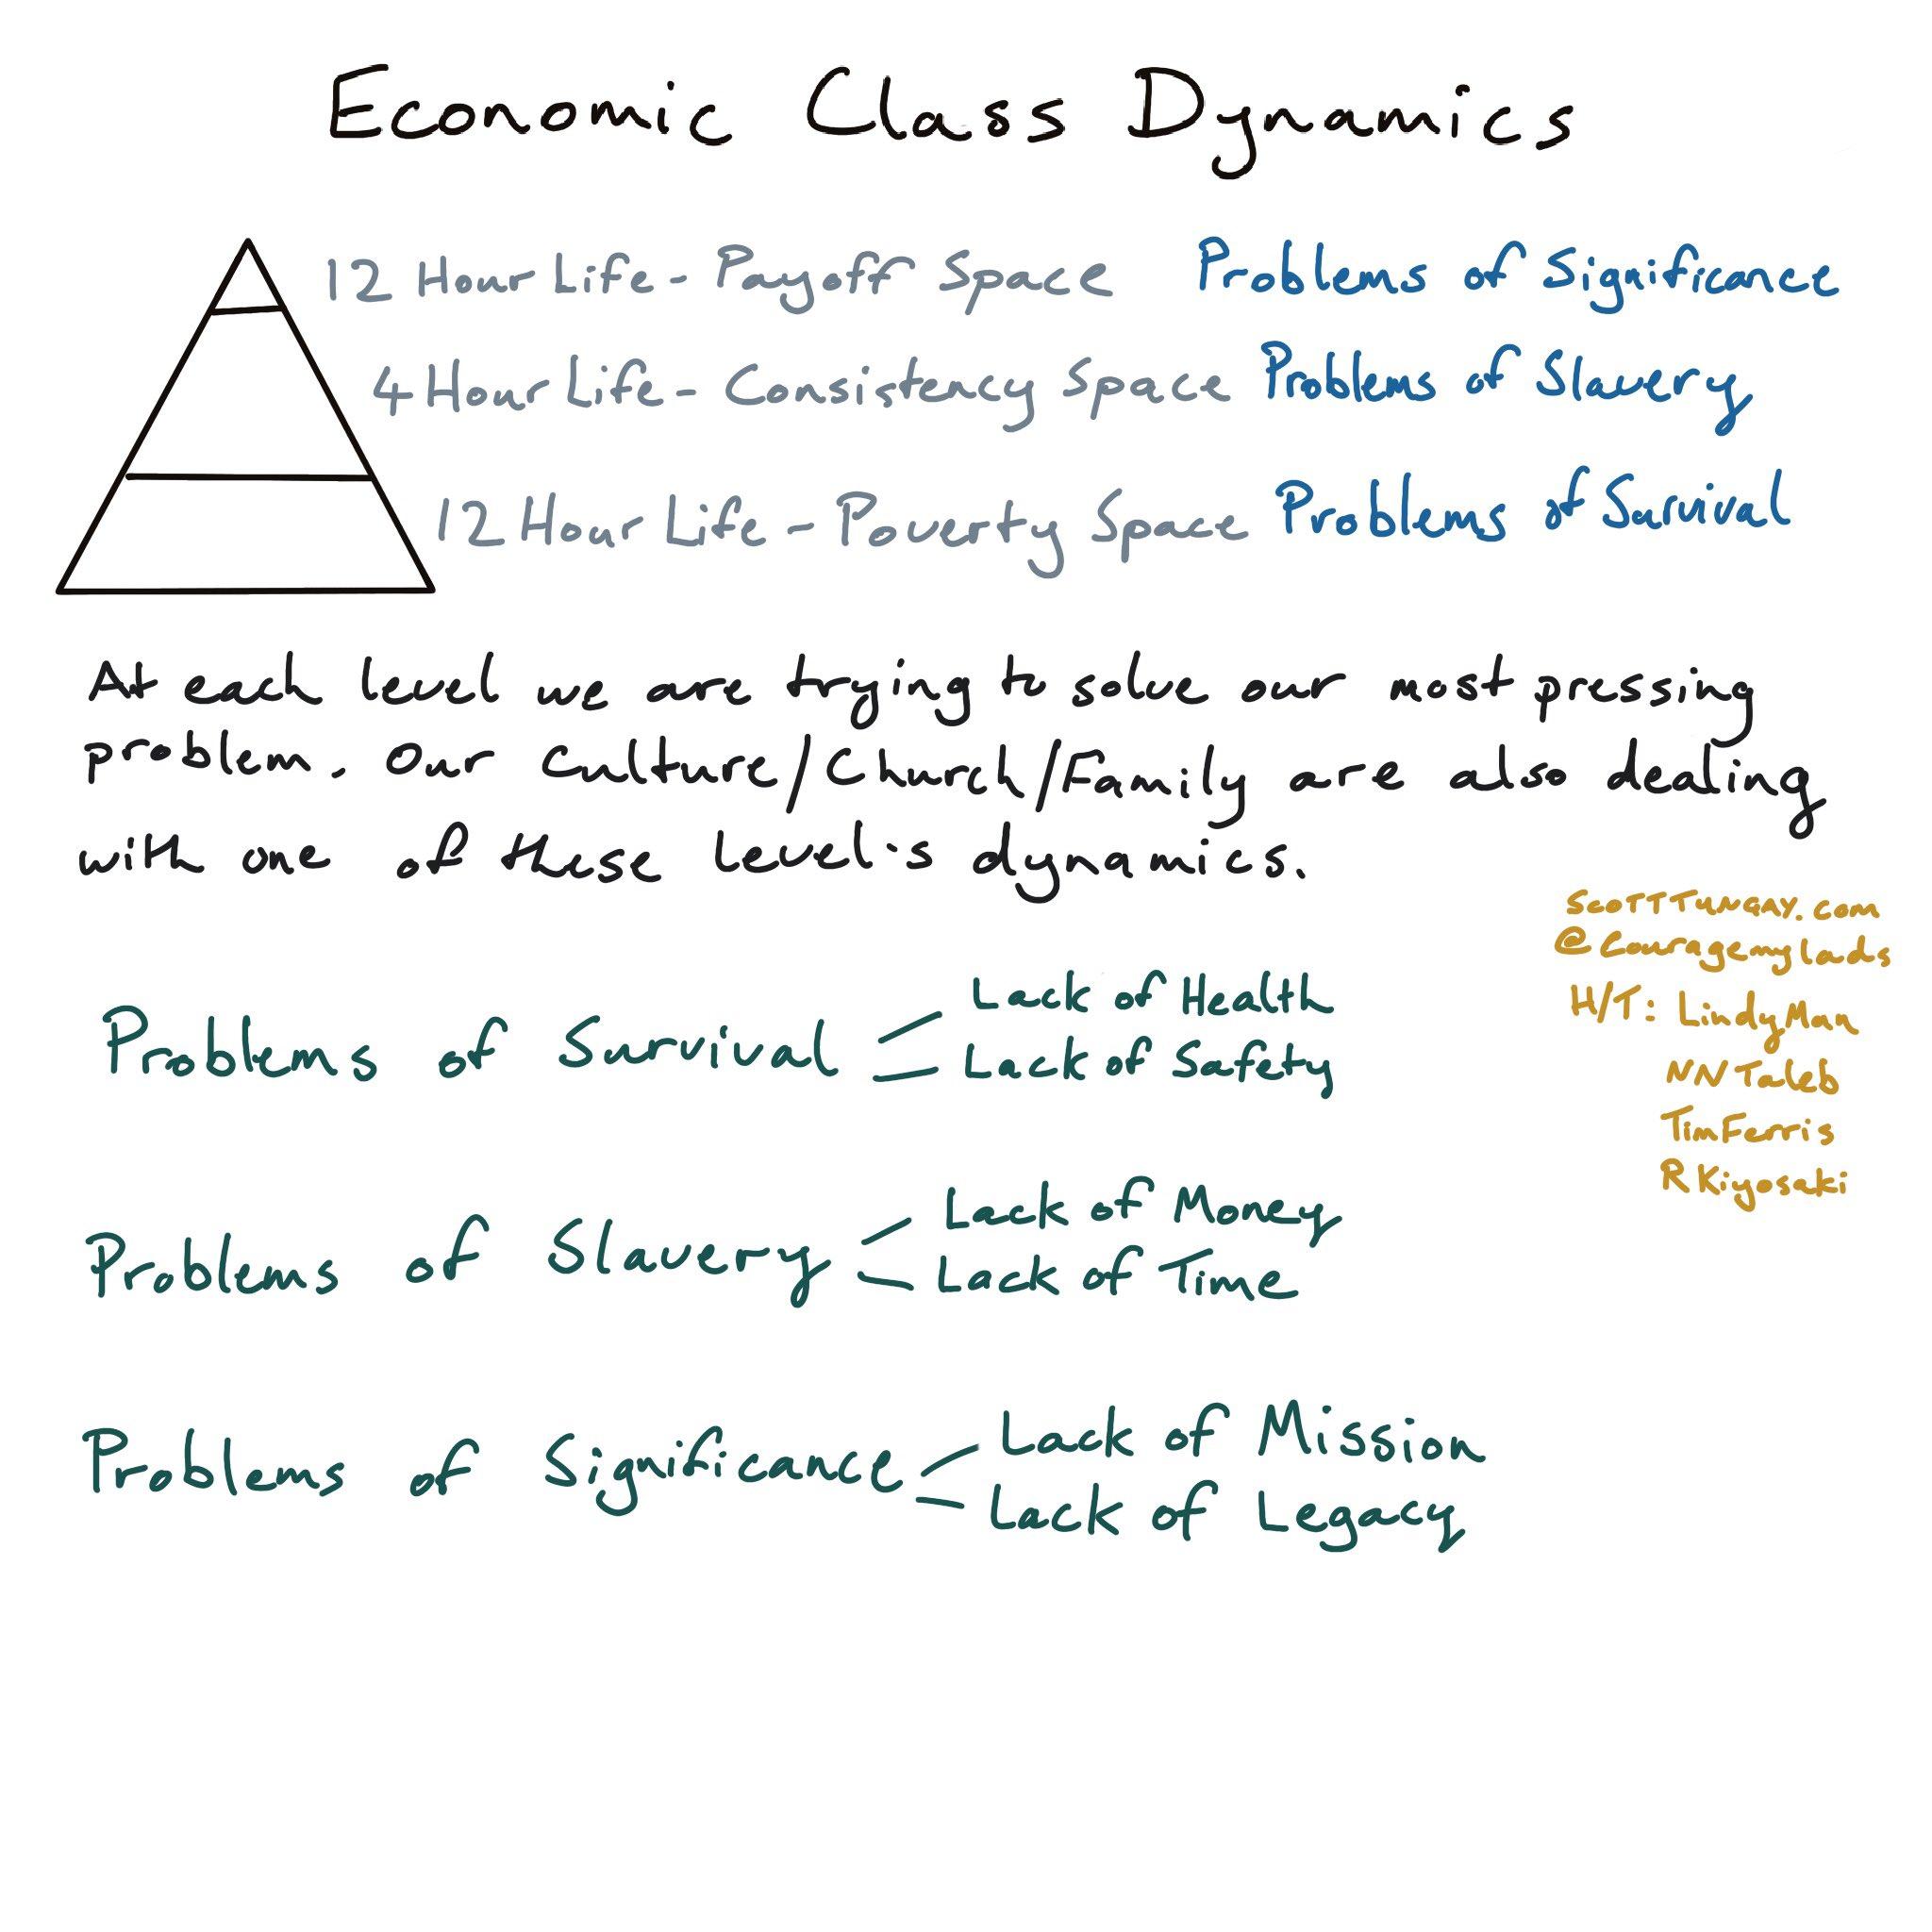 EconClassDynamics